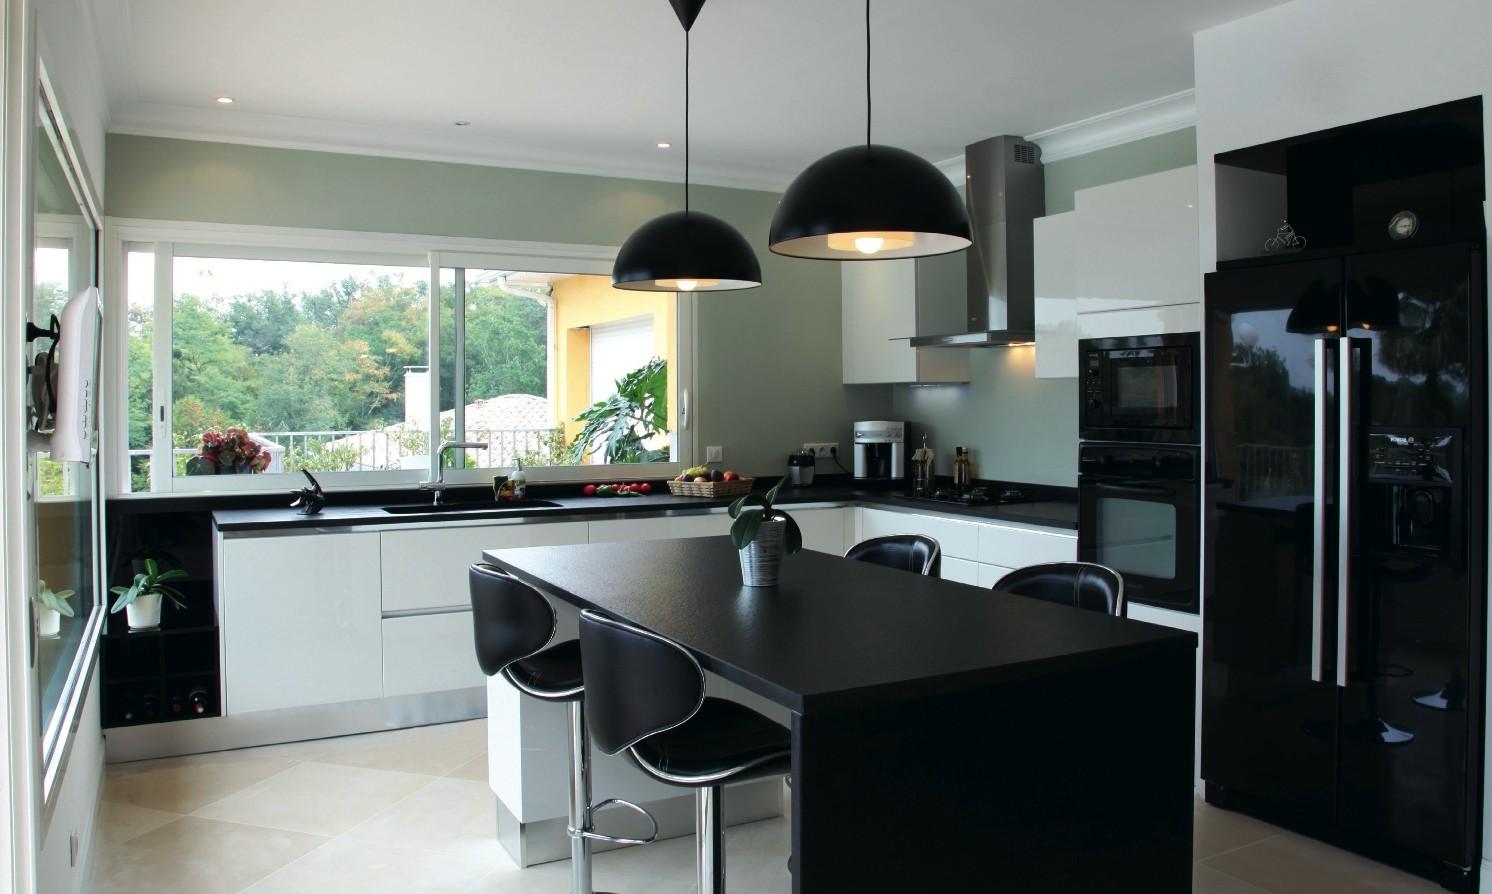 Meuble cuisine design contemporain cuisine id es de for Cuisine meuble design